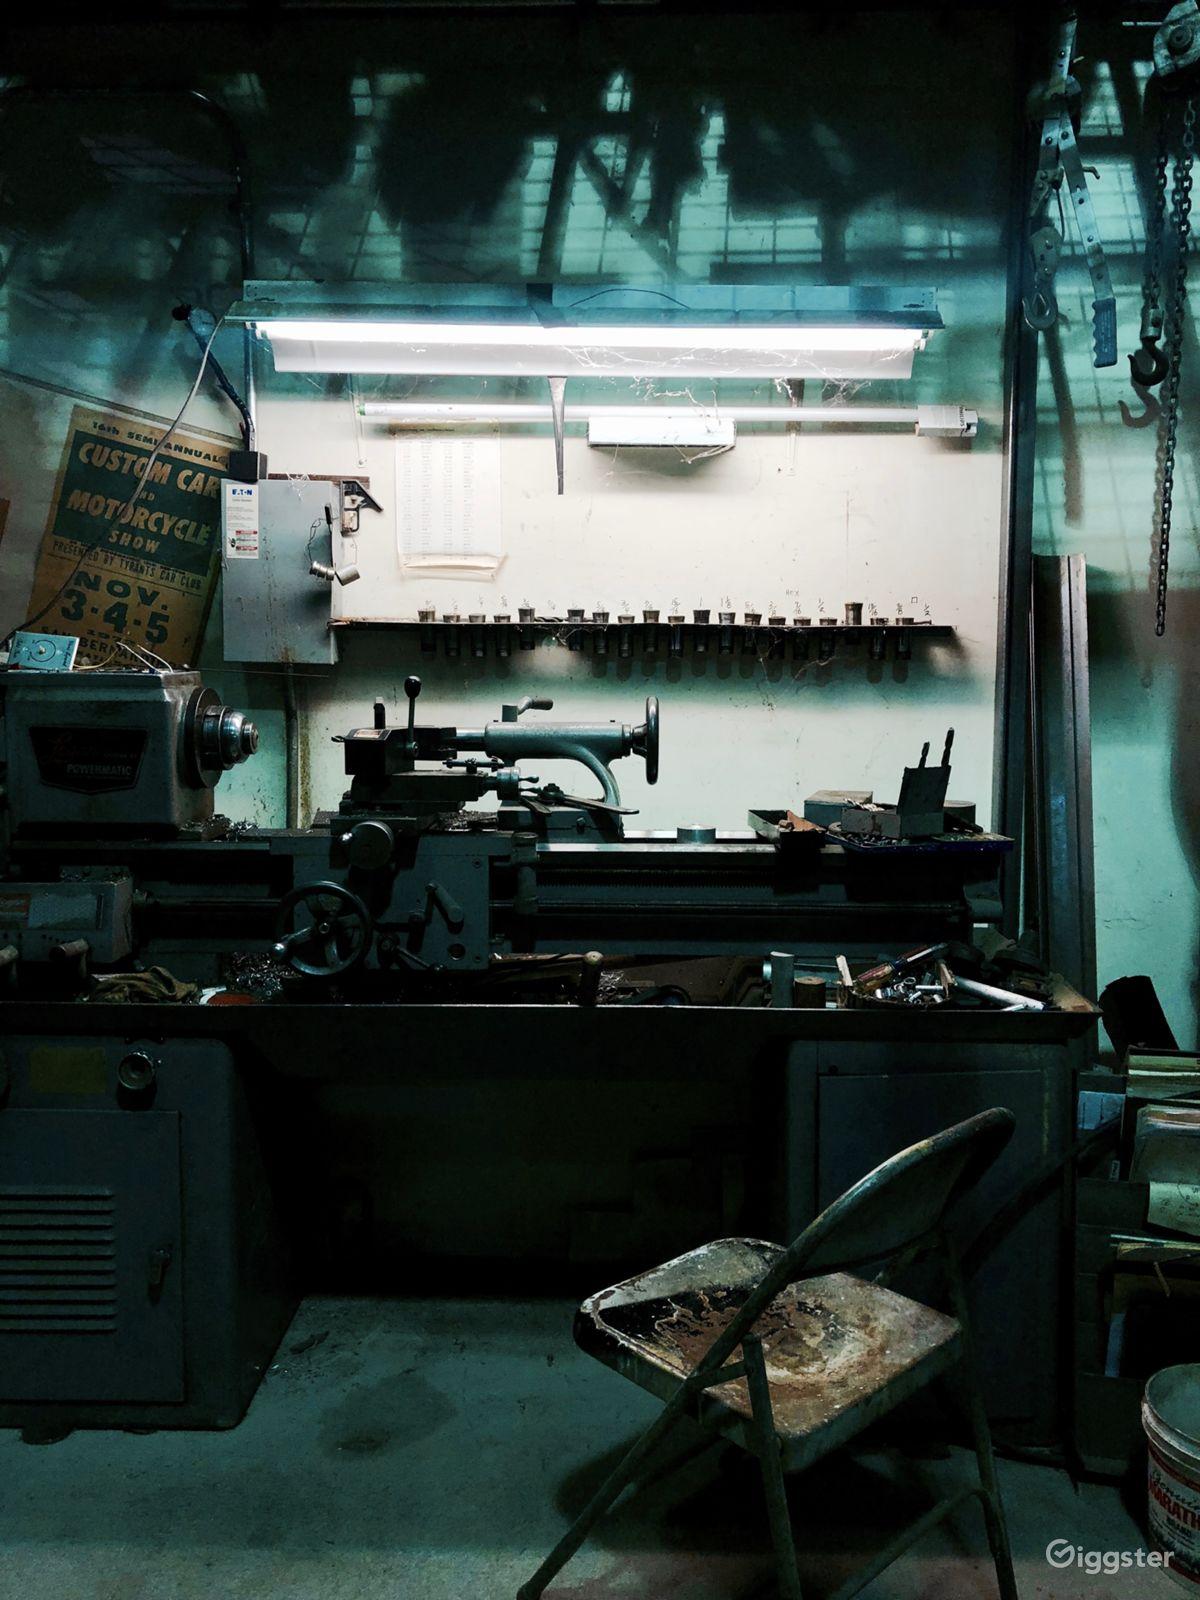 Rent the Film Studio, Photography Studio(studio) Creative Garage/Warehouse Space in